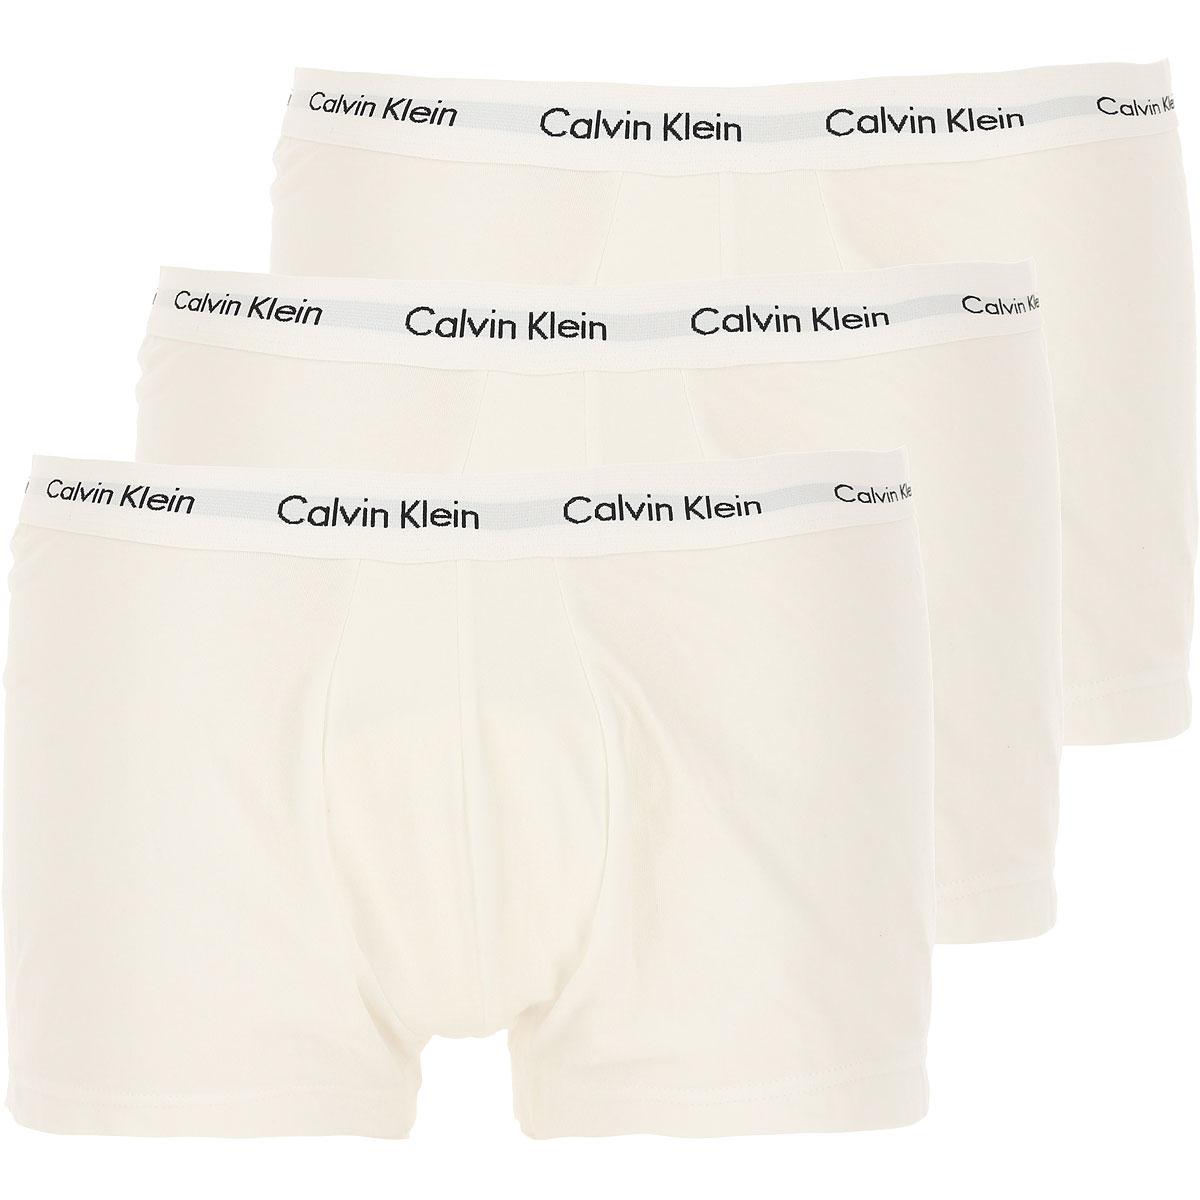 Calvin Klein Boxer Briefs for Men, Boxers, 3 Pack, White, Cotton, 2017, M (EU 4) XS (EU 2)